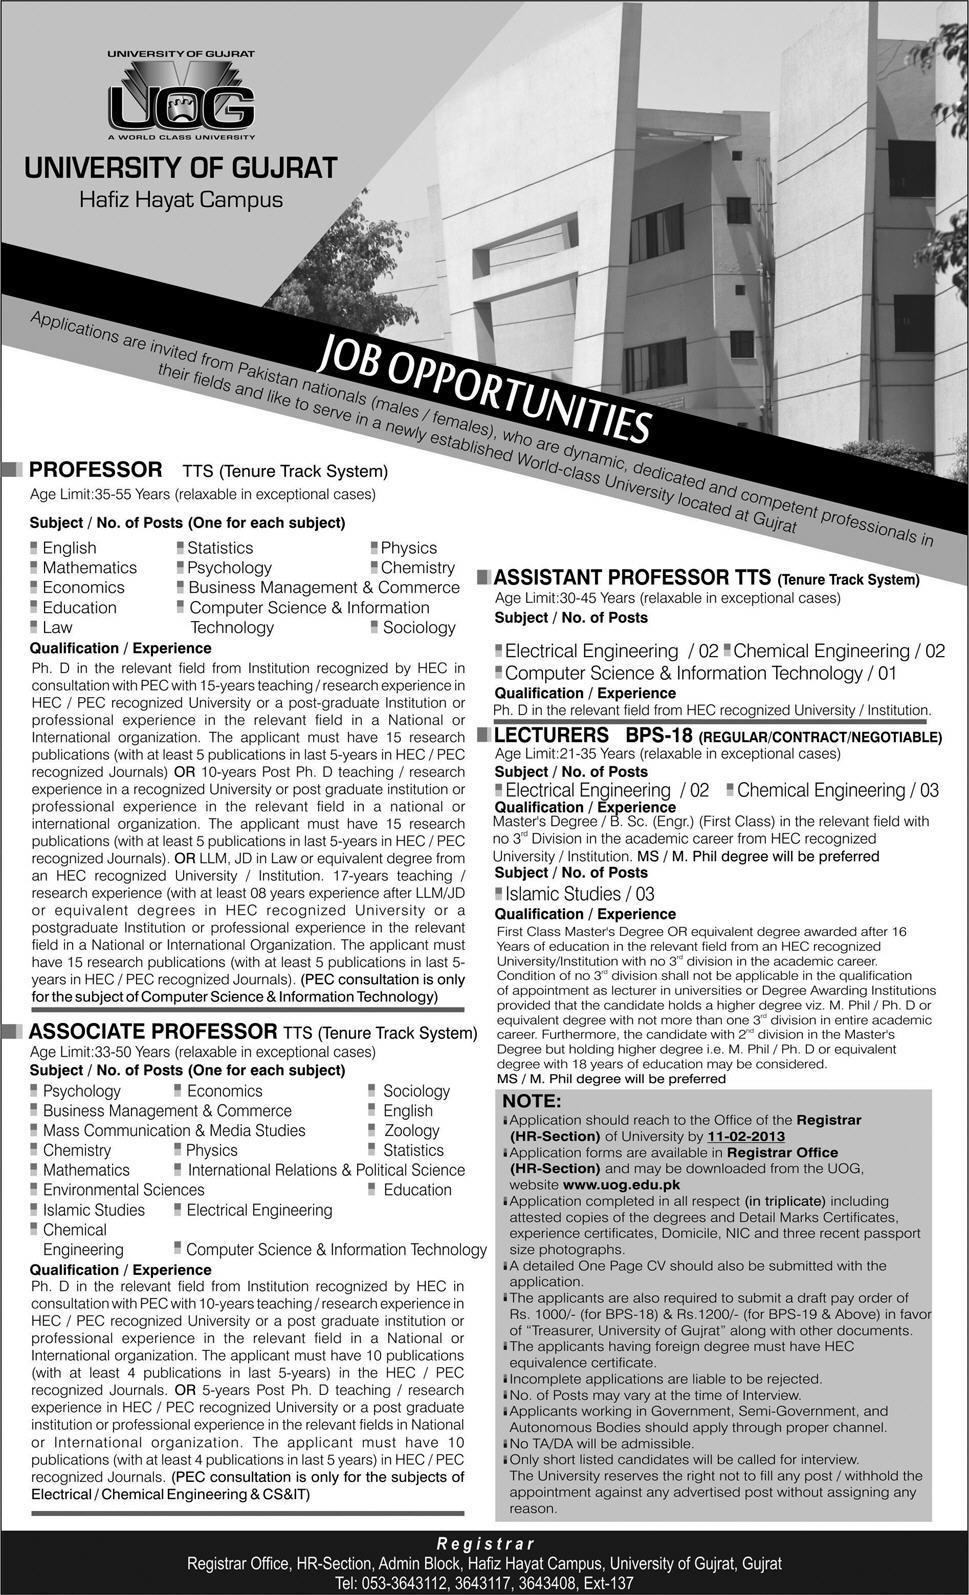 University of Gujrat Hafiz Hayat Campus Jobs 2013